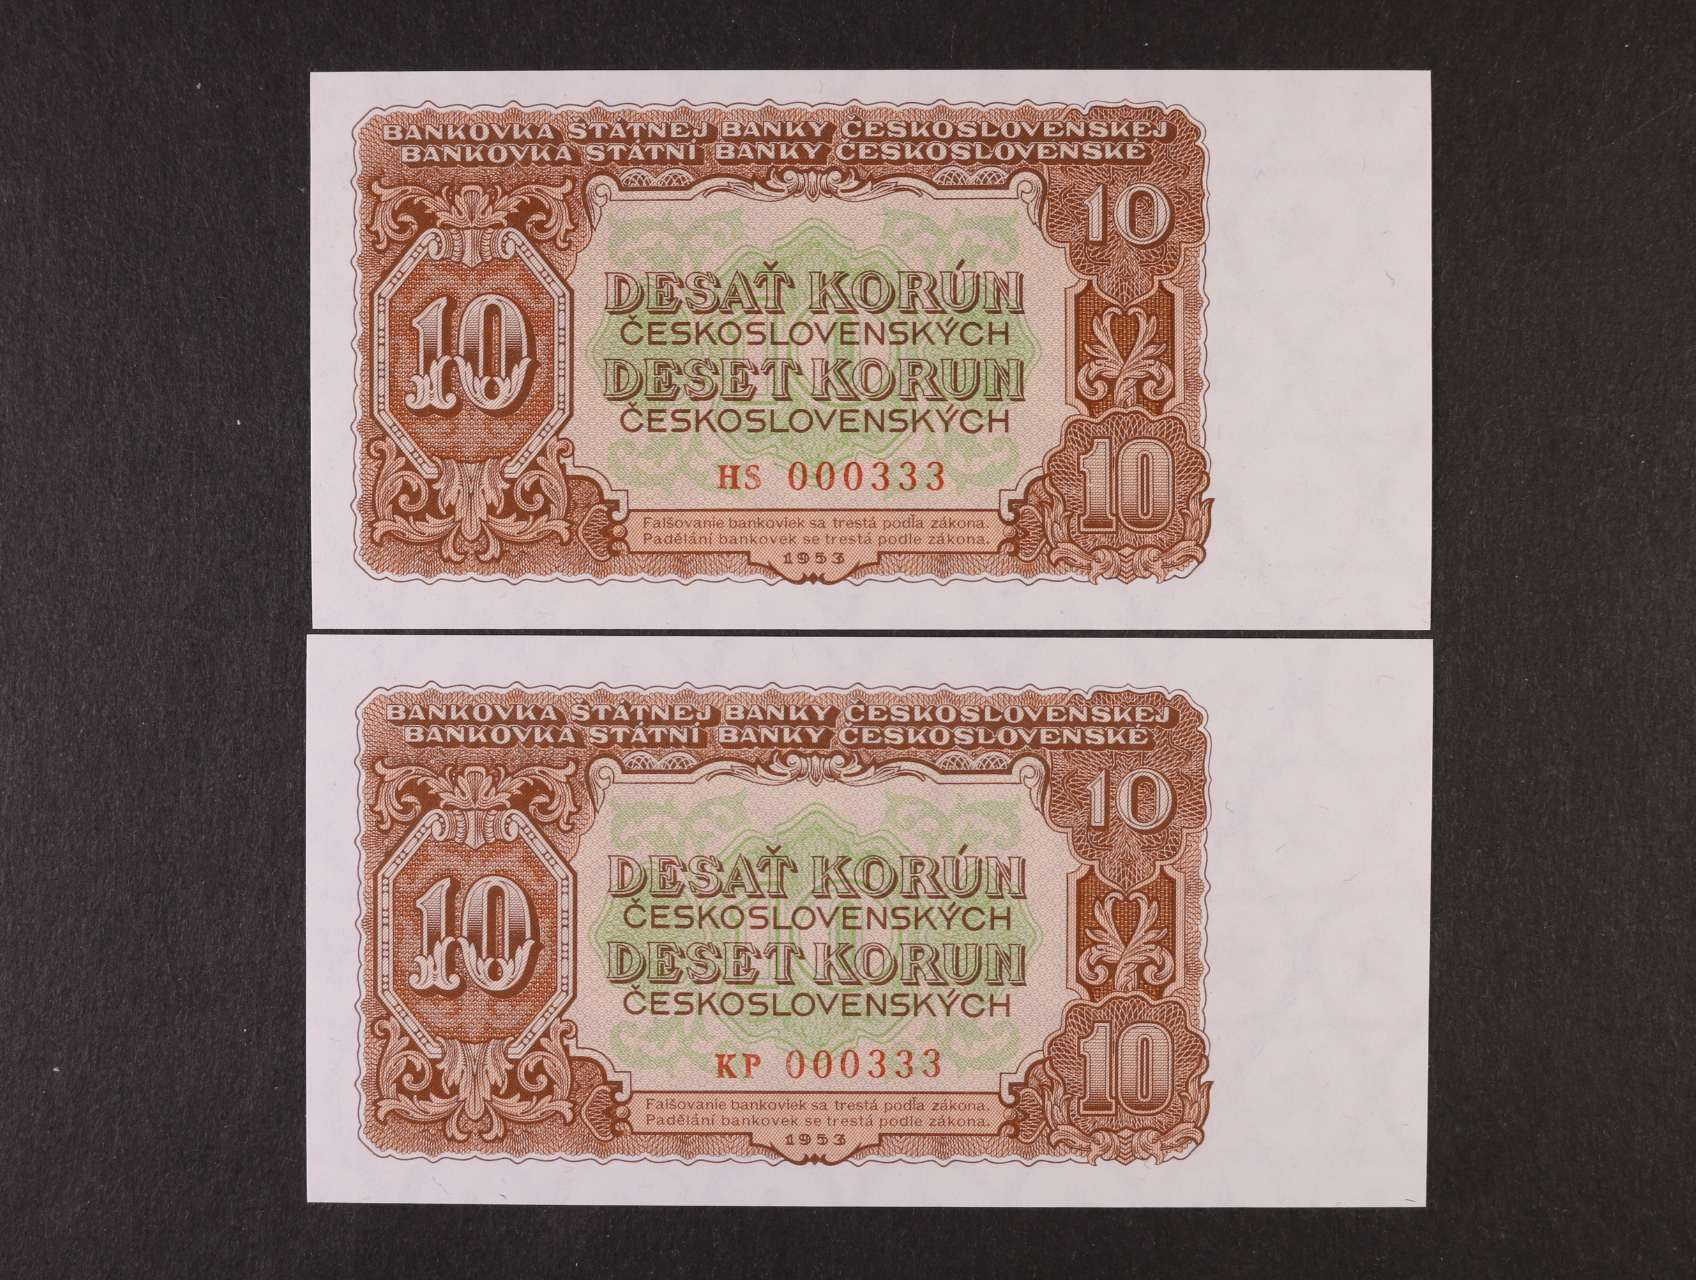 10 Kčs 1953 série HS 000333 a KP 000333, zajímavá čísla, Ba. 89b, Pi. 83b